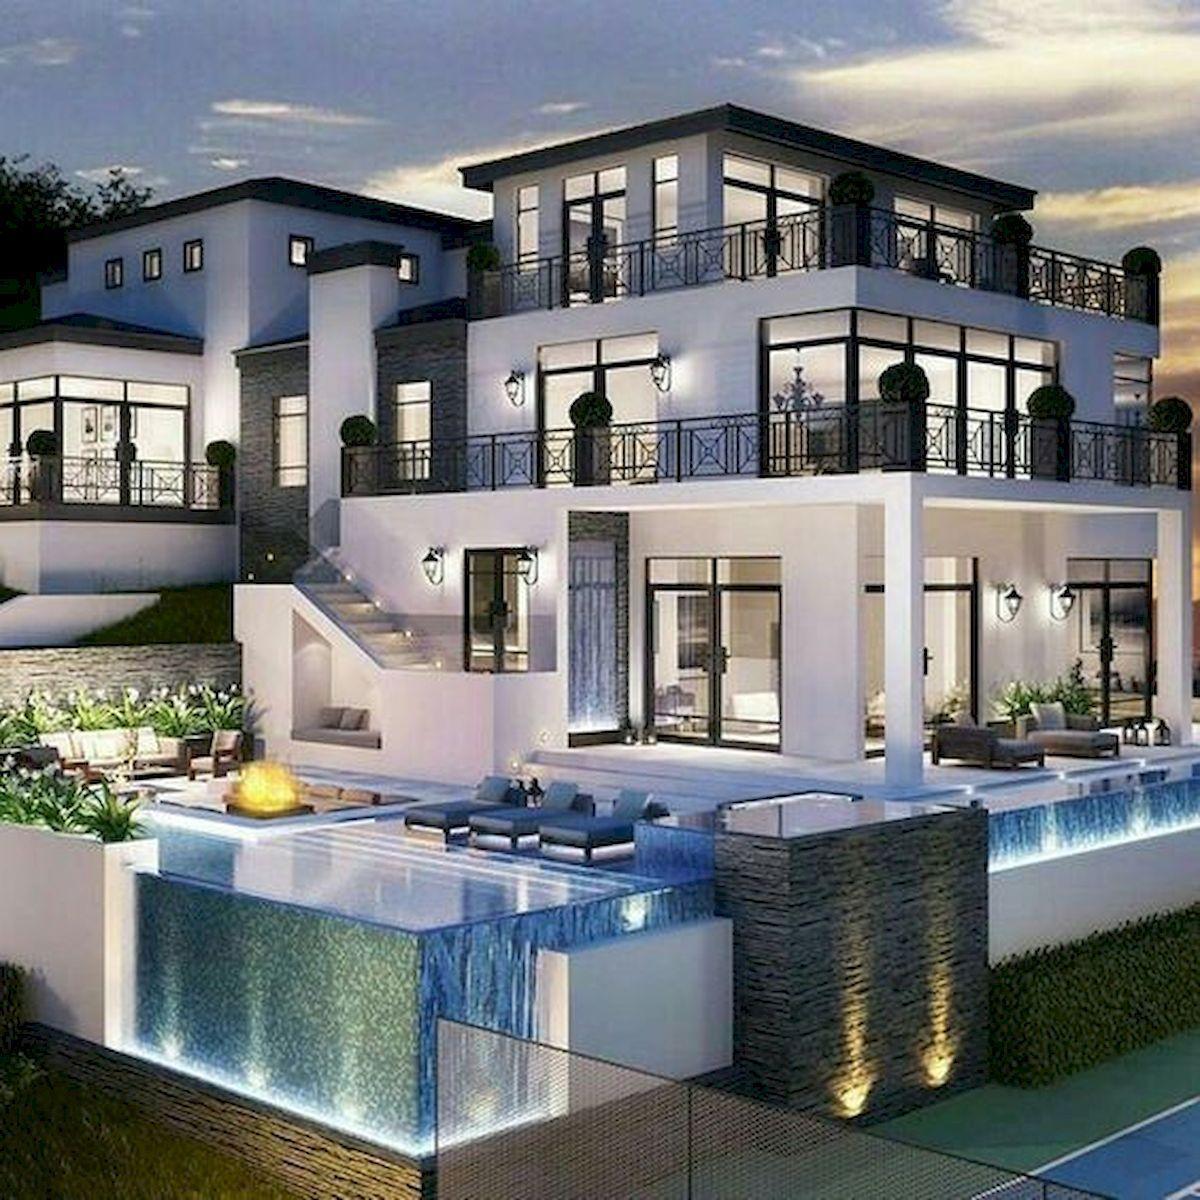 65 Stunning Modern Dream House Exterior Design Ideas 61 Googodecor Dream House Architecture House Luxury Homes Dream Houses